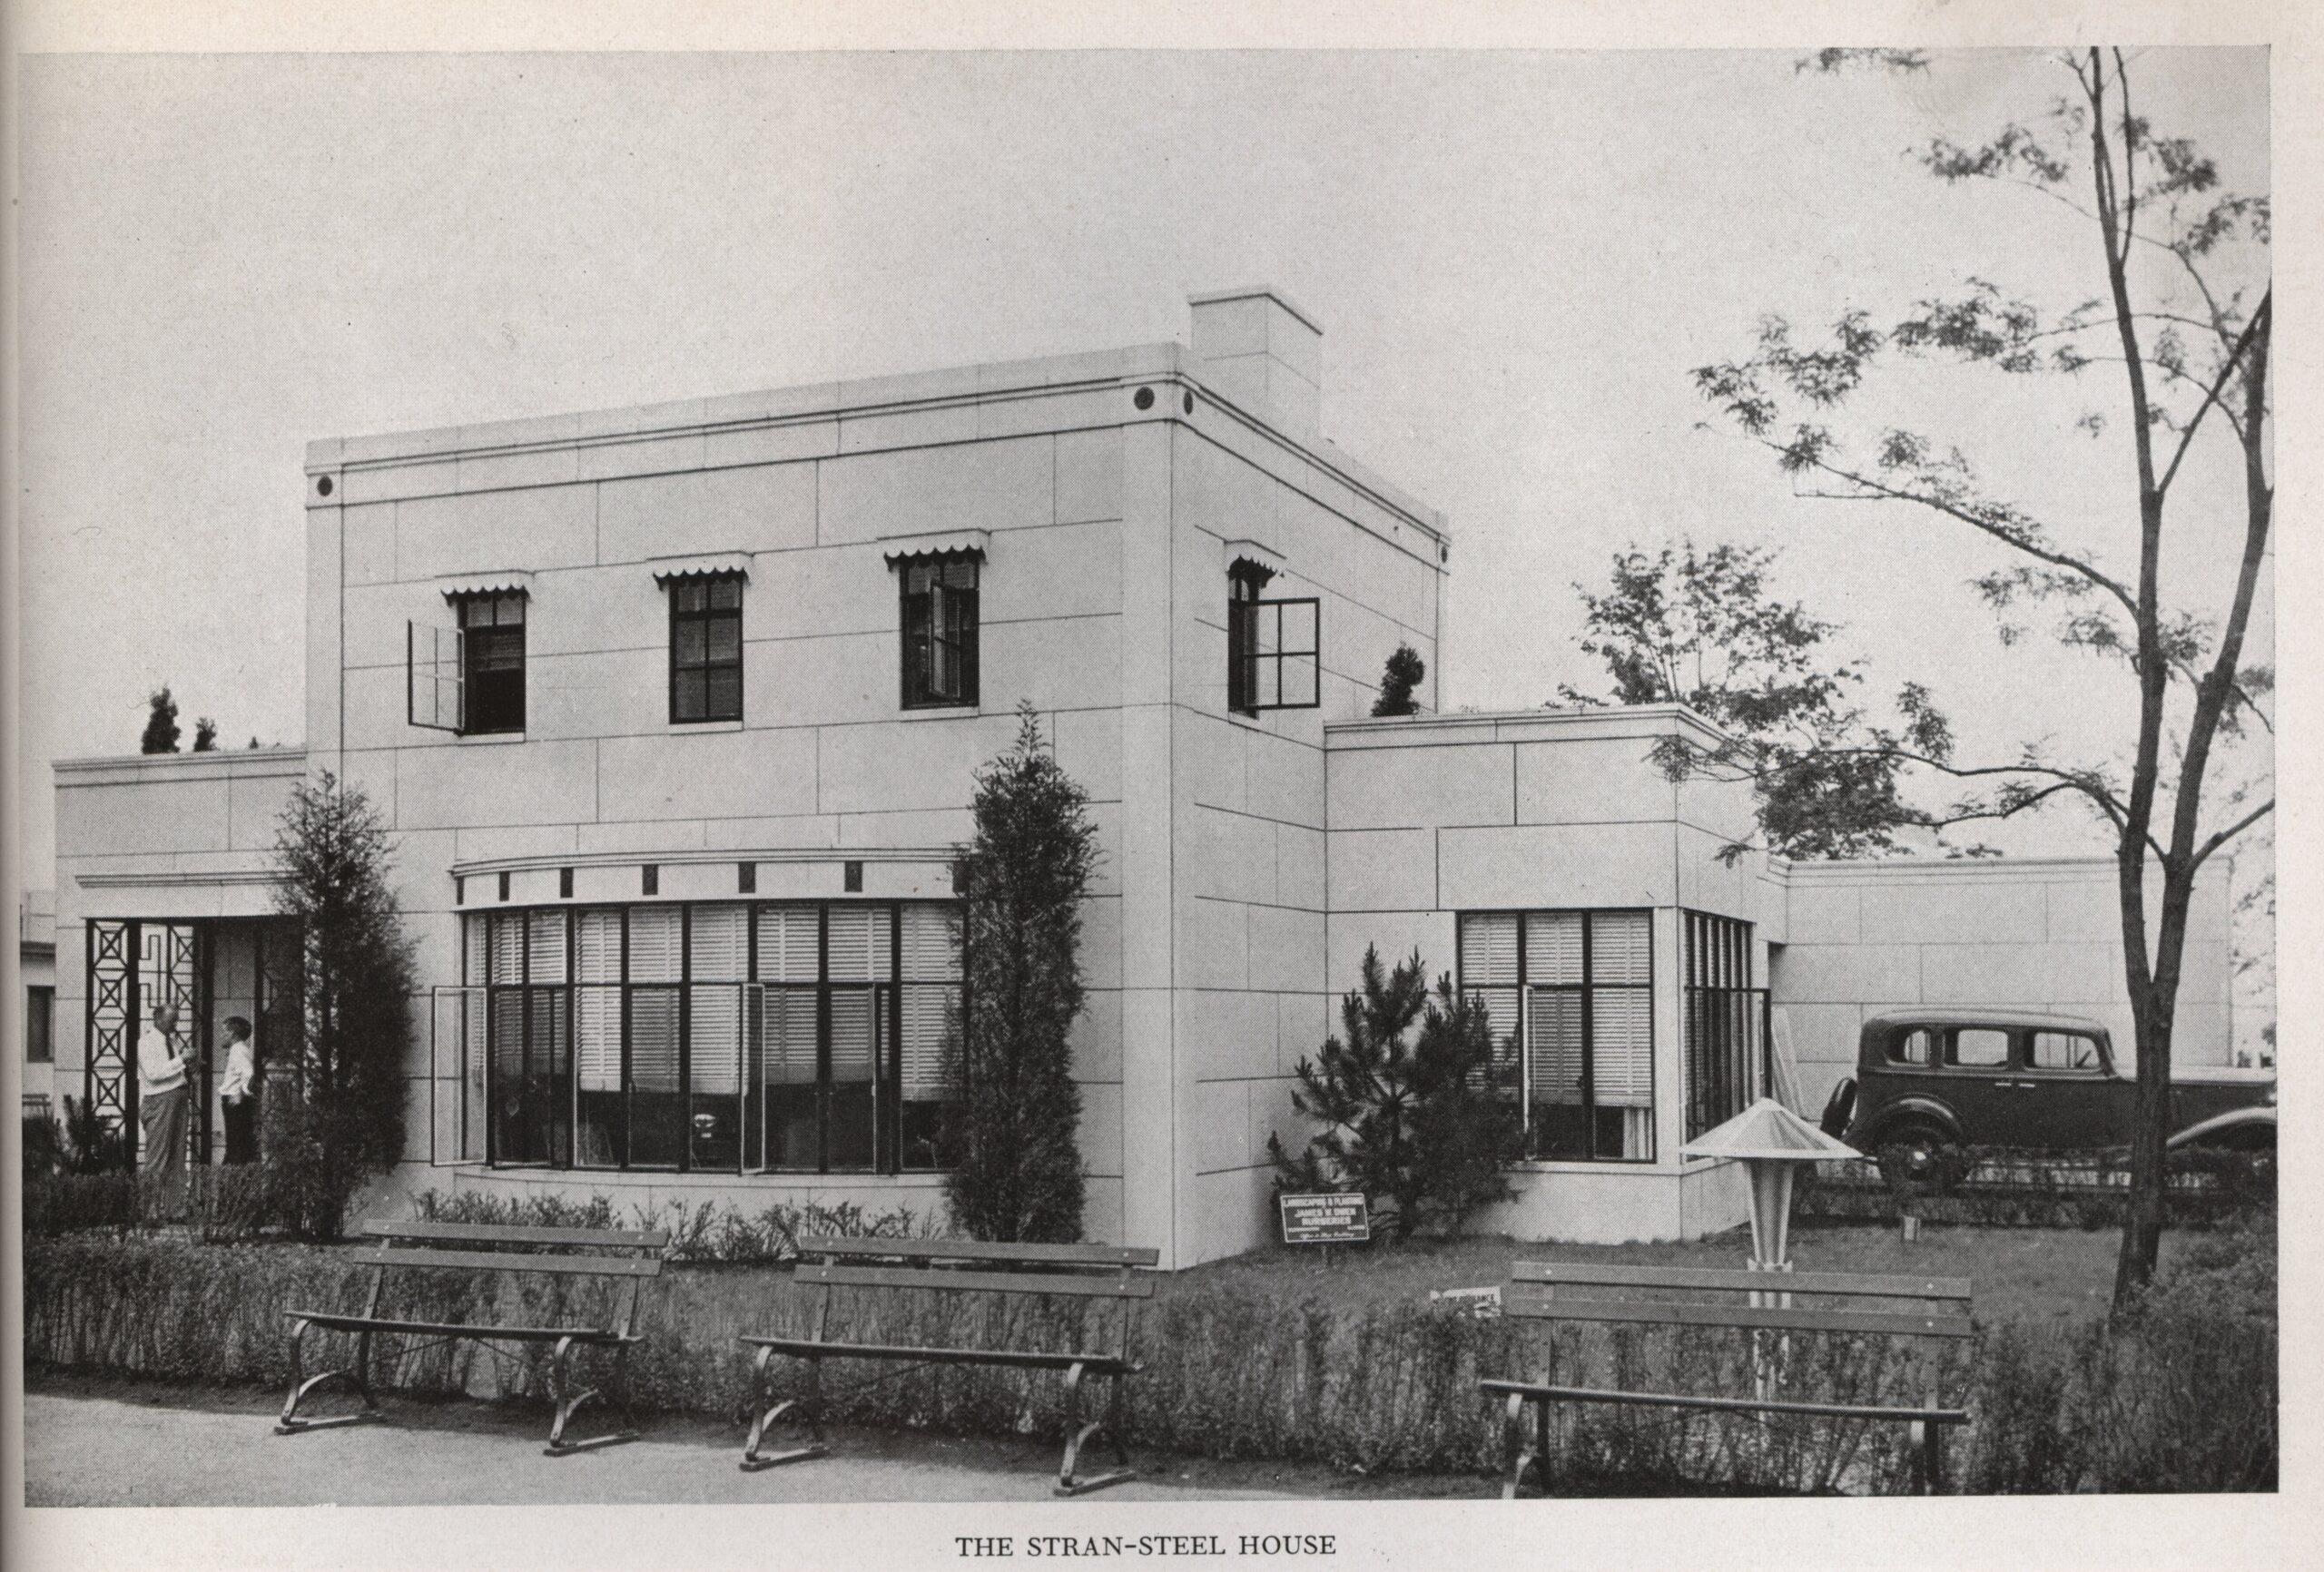 Stran Steel House